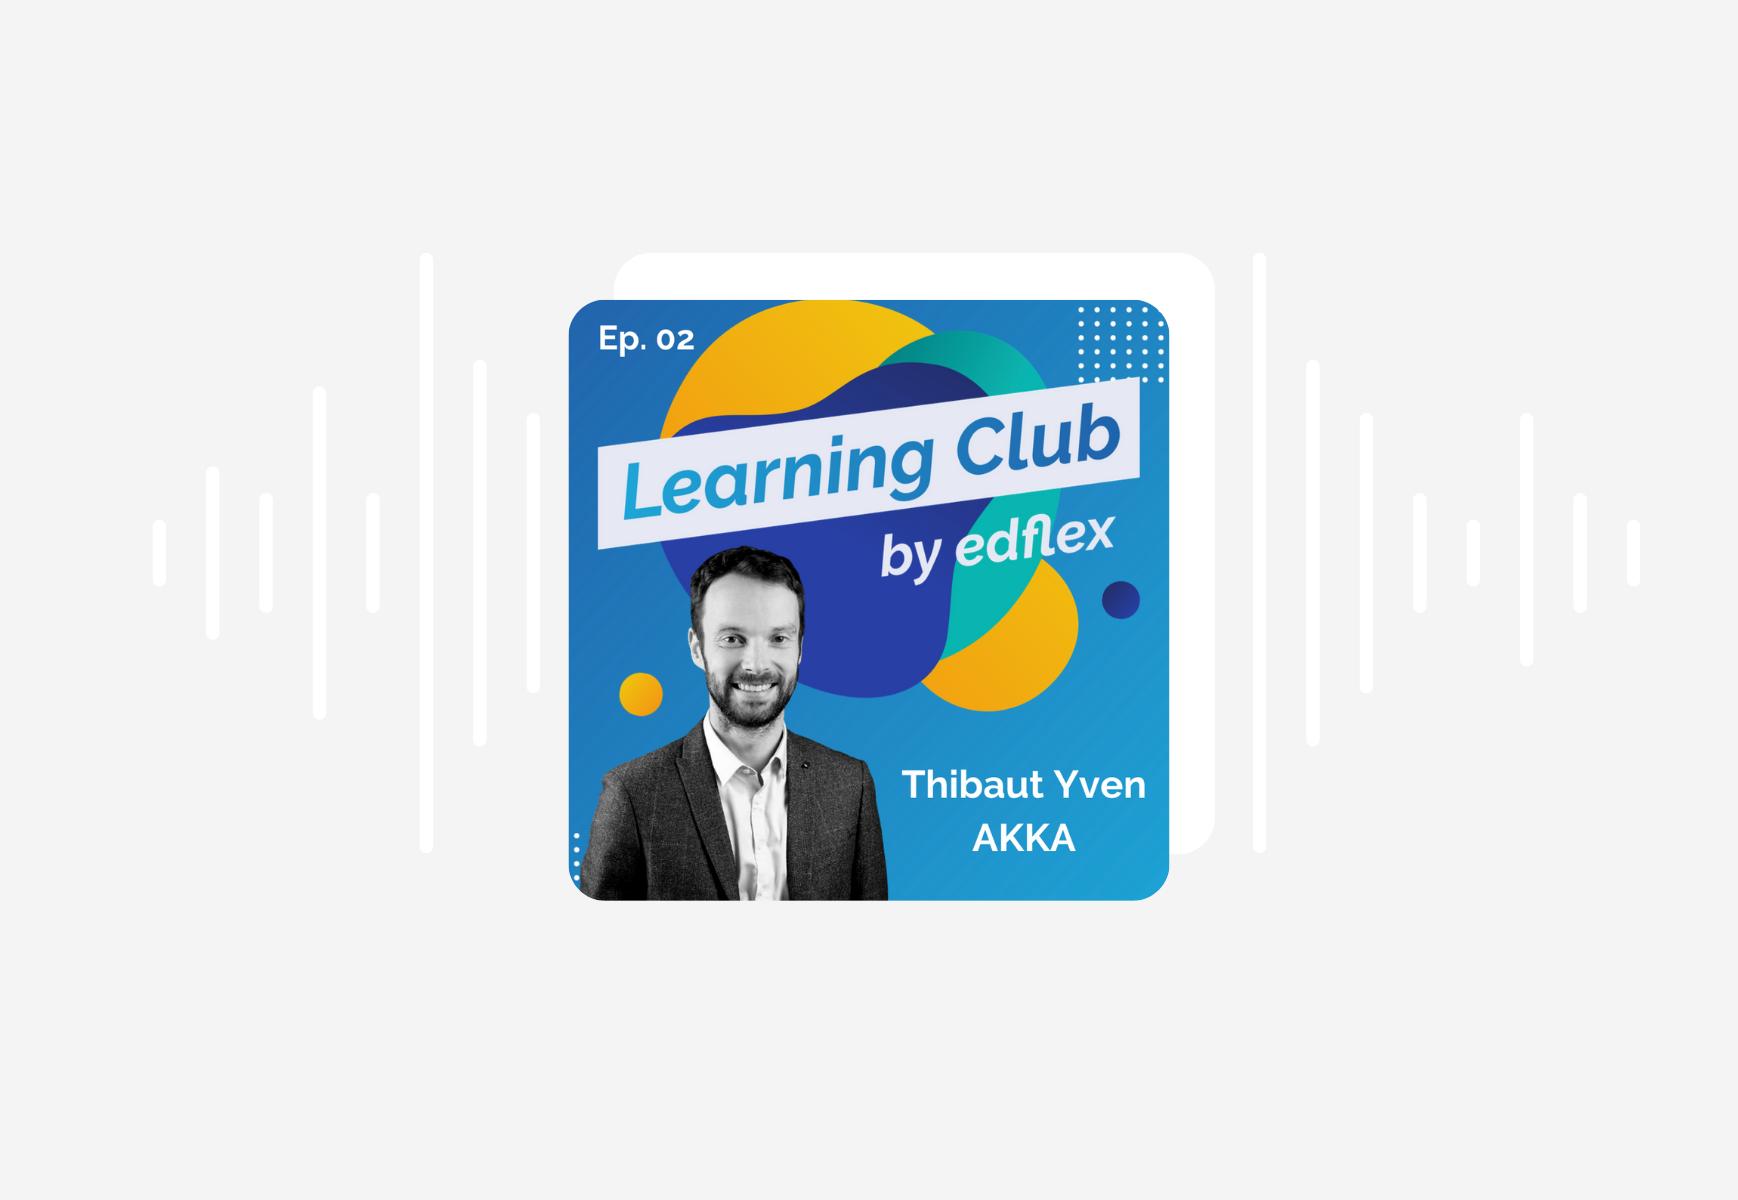 Thibaut Yven AKKA - Learning club